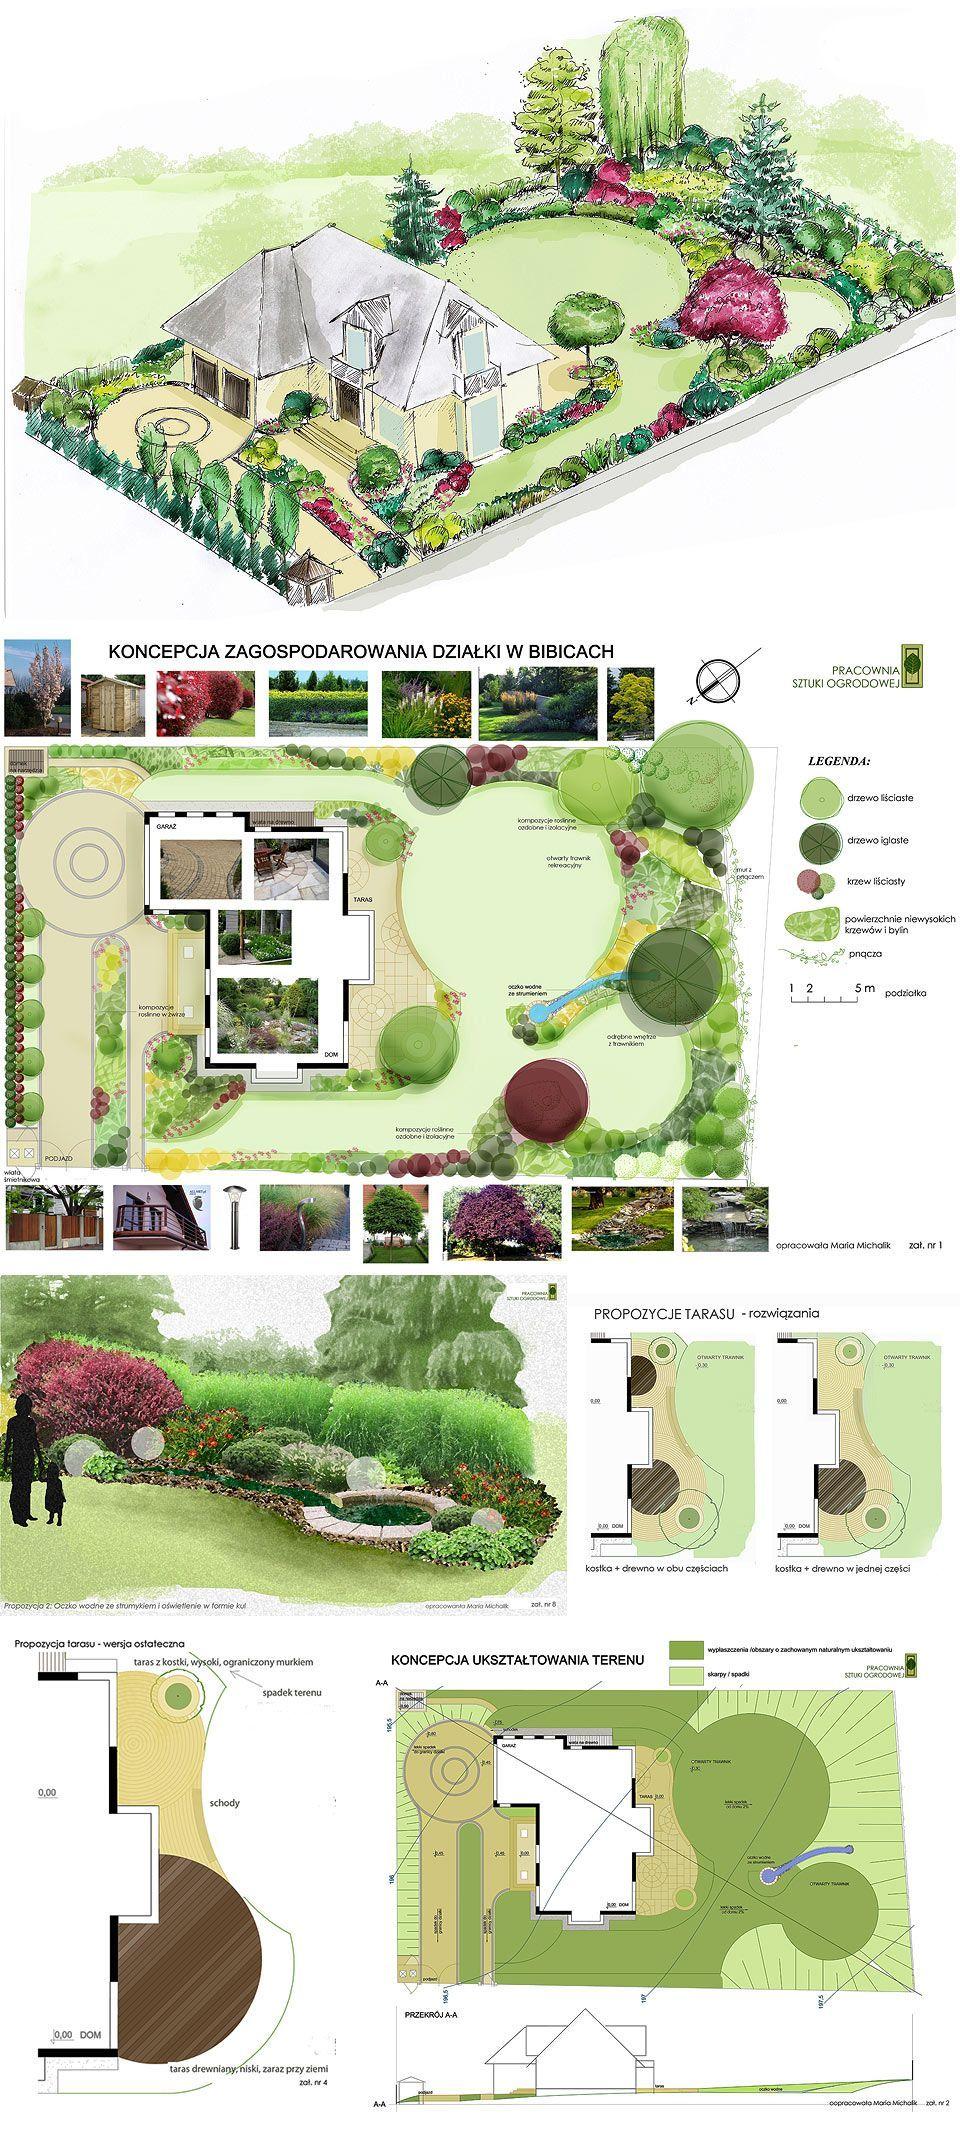 Pin By Elzbieta Rymkiewicz Mlodkowska On Graphics Plans Sketch Garden Design Plans Landscape Design Plans Garden Design Backyard landscape design plans